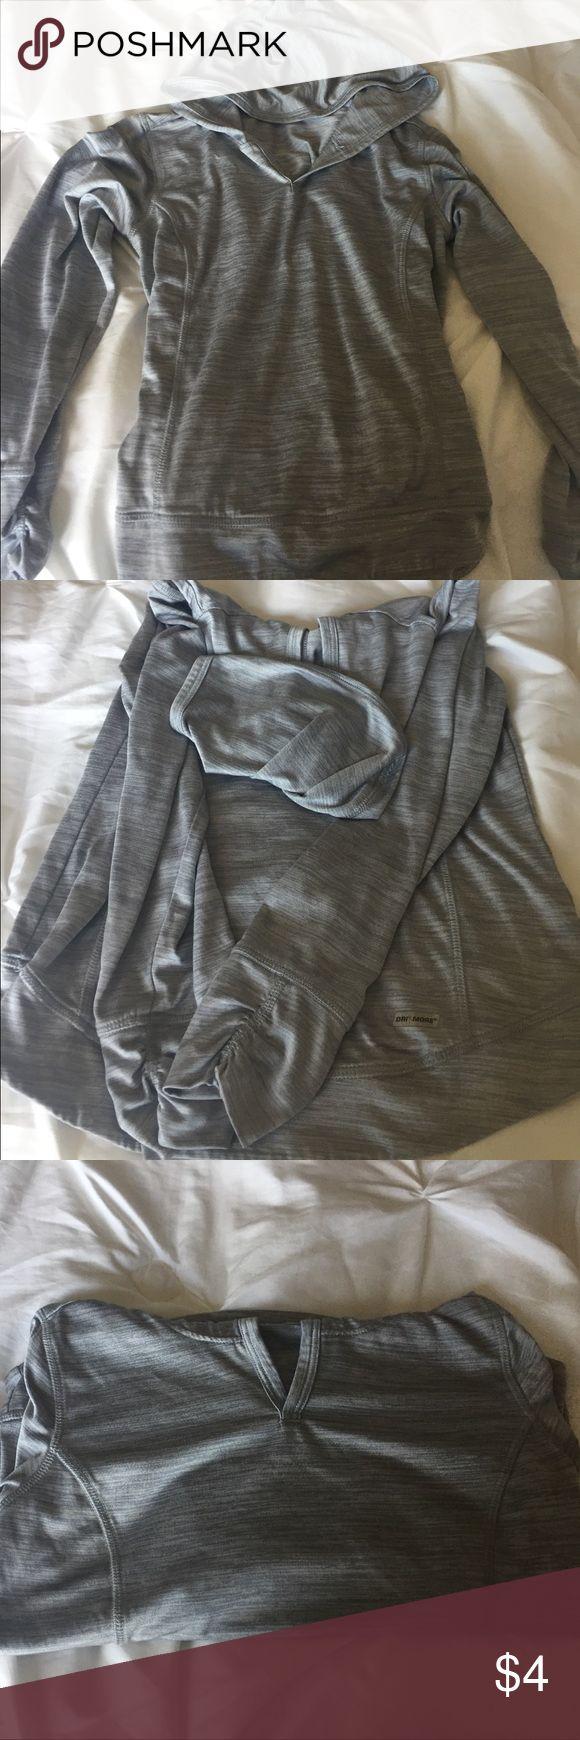 Athletic Wear Sweatshirt Barely warn, super comfy, grey athletic wear thin hoodie. Danskin Now Shirts & Tops Sweatshirts & Hoodies